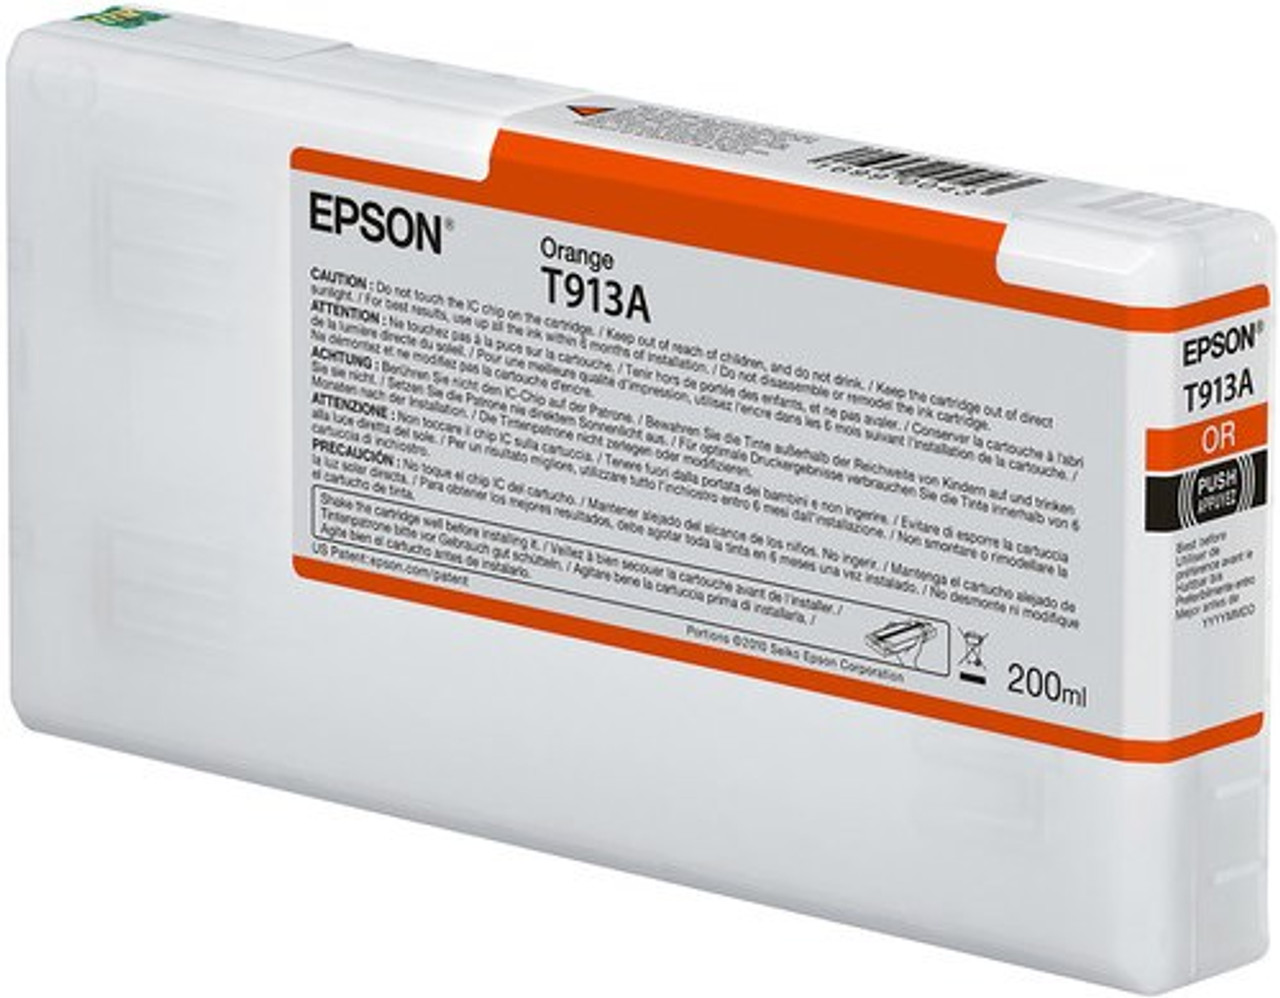 Epson Ultrachrome HDX Orange Ink Cartridge 200ml for SureColor P5000 Printers - T913A00